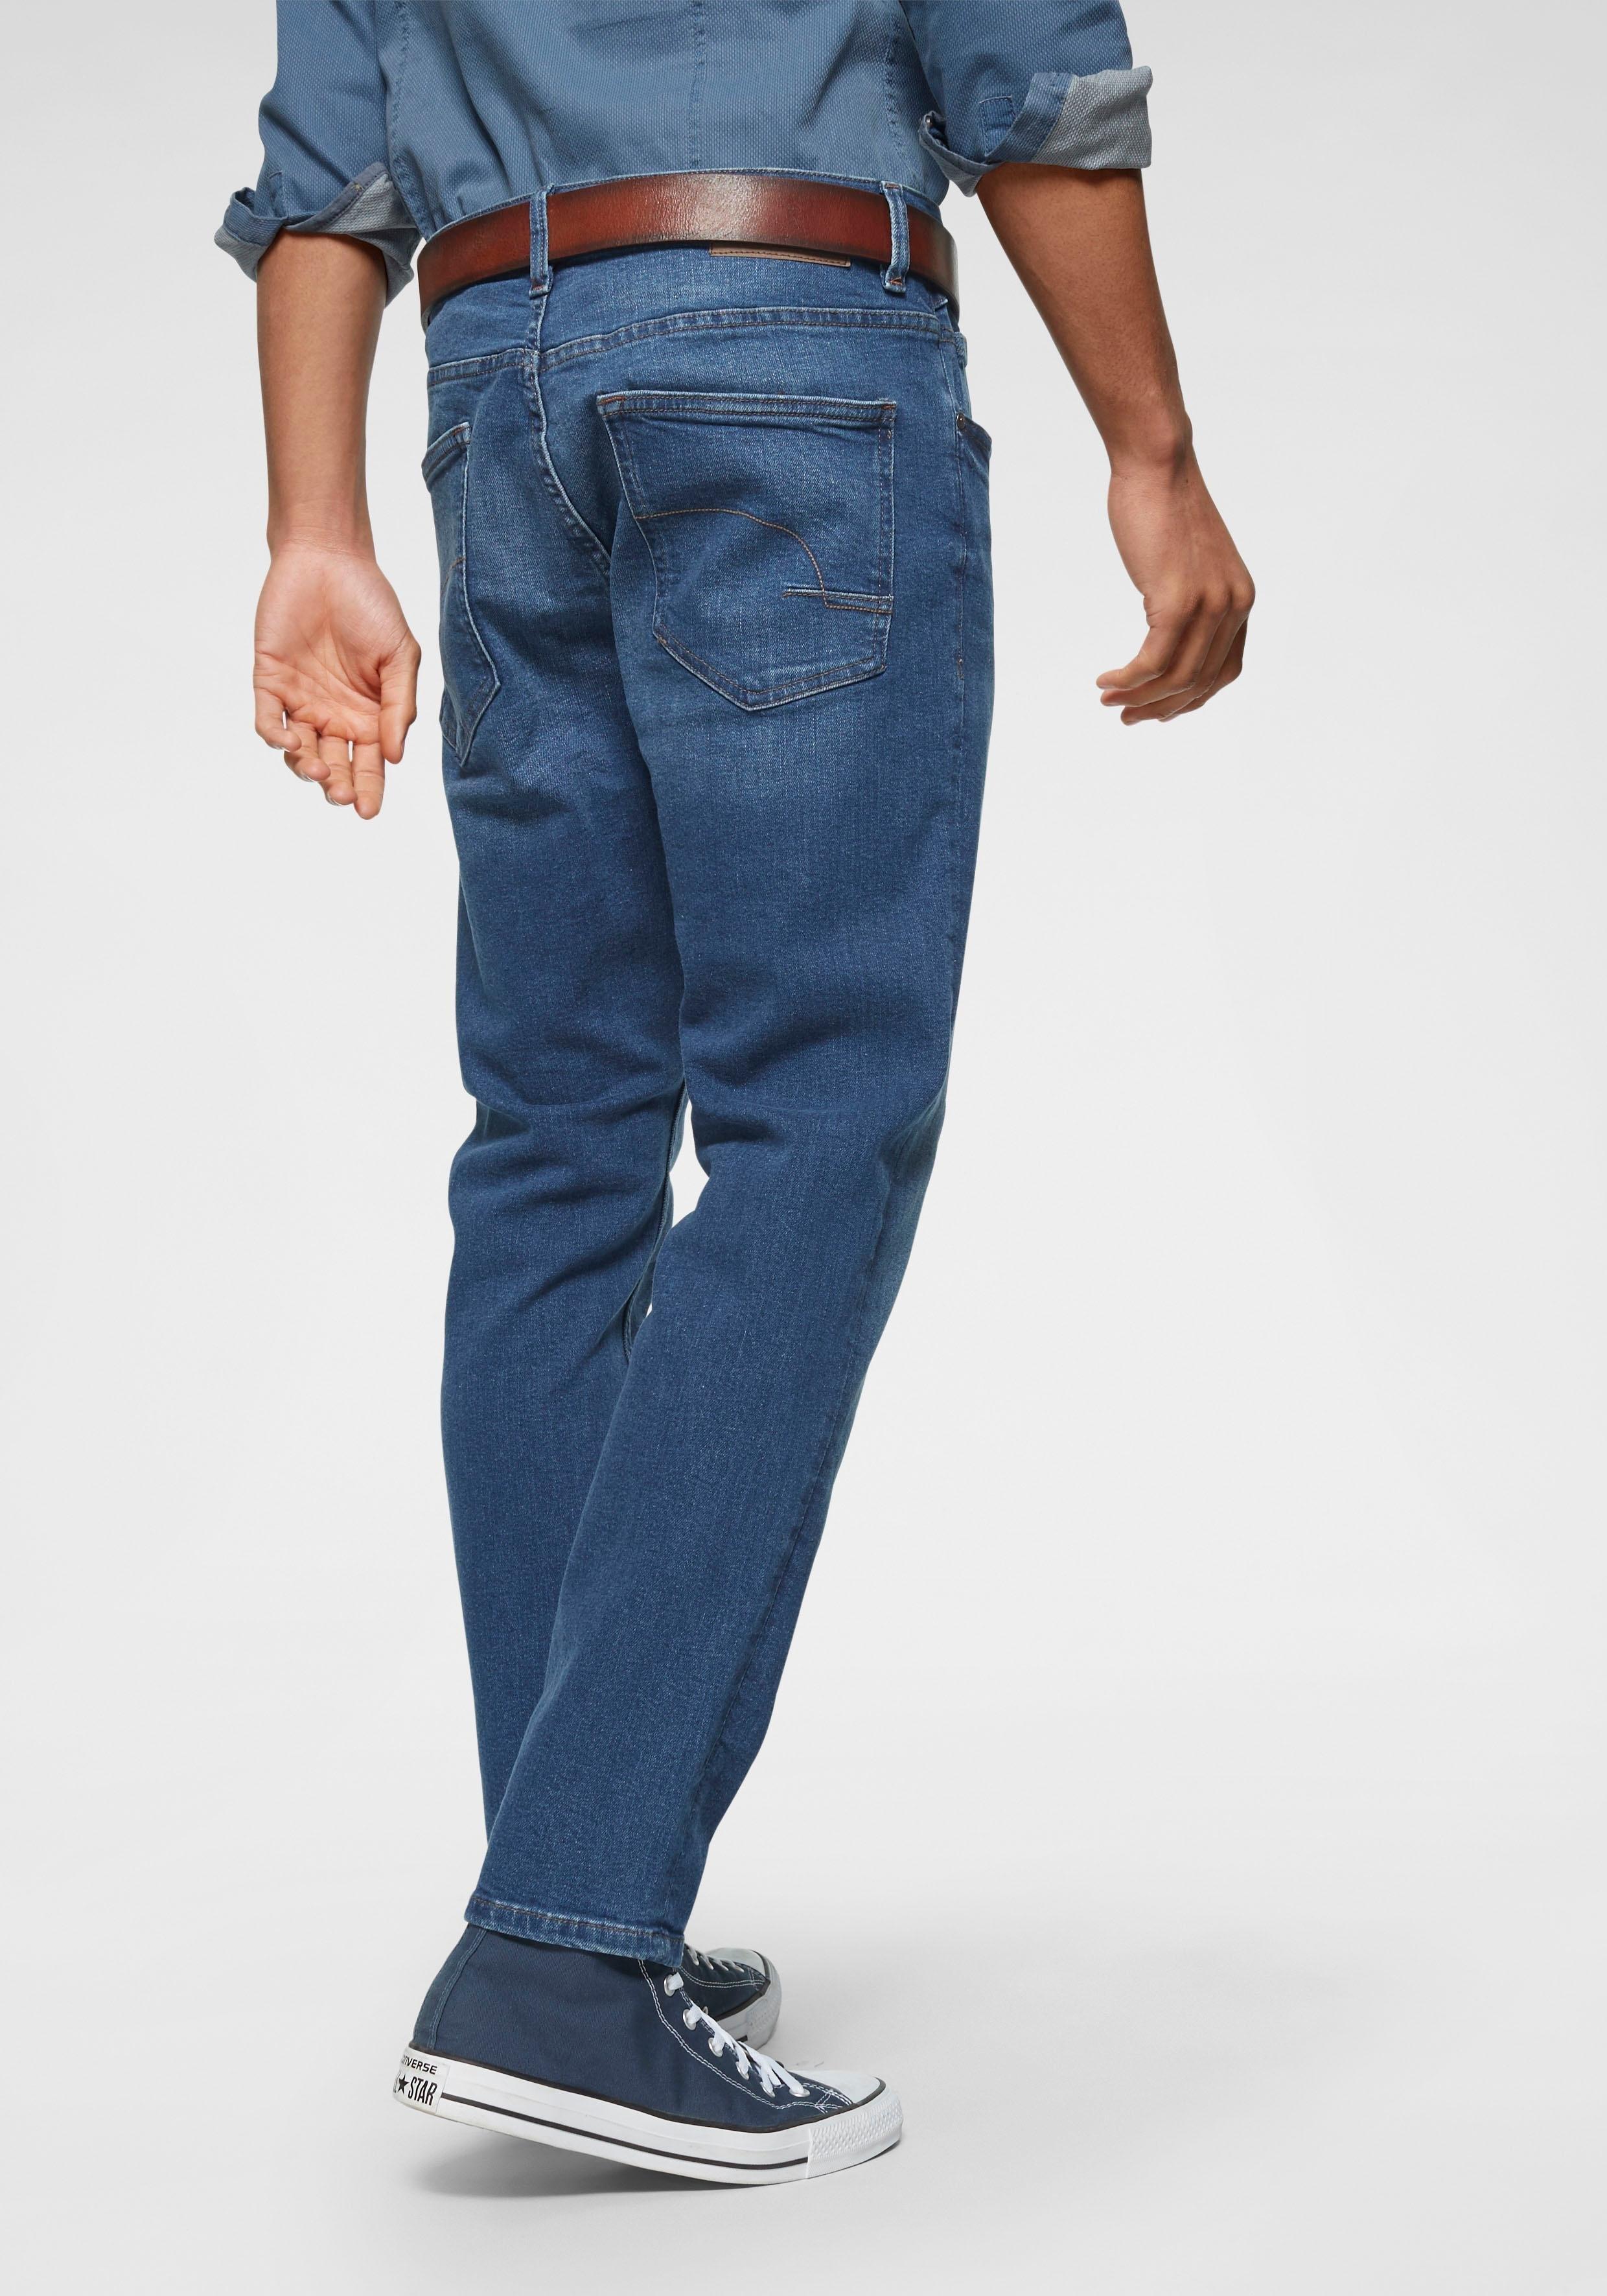 factory authentic shop best sellers usa cheap sale slim fit jeans